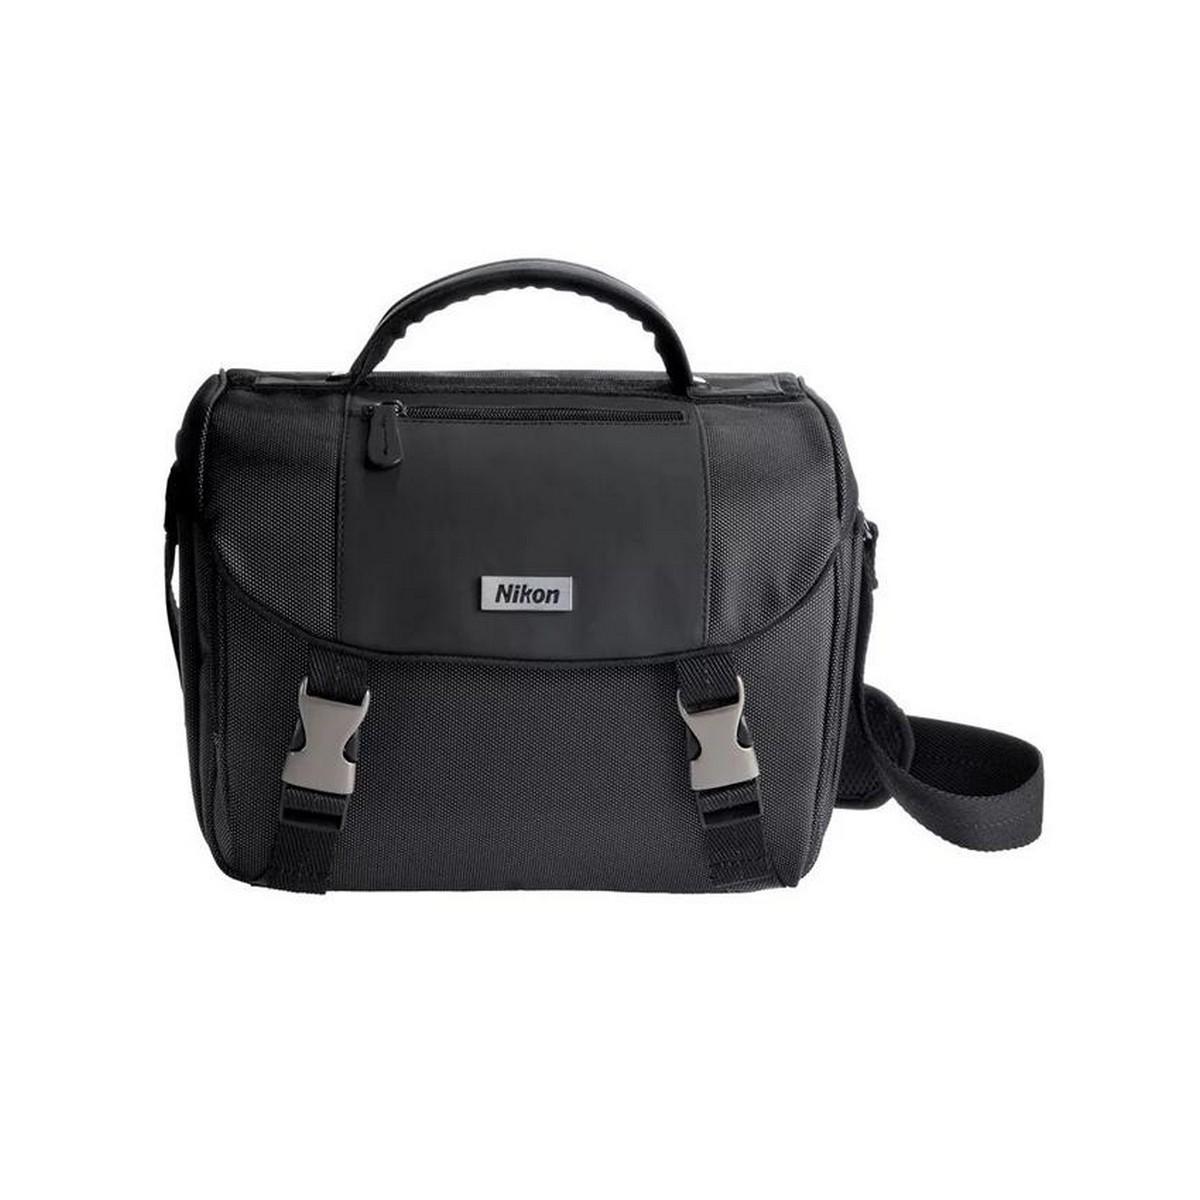 Nikon Deluxe Digital SLR DSLR Camera Gadget Accessories Bag Good Quality-Black